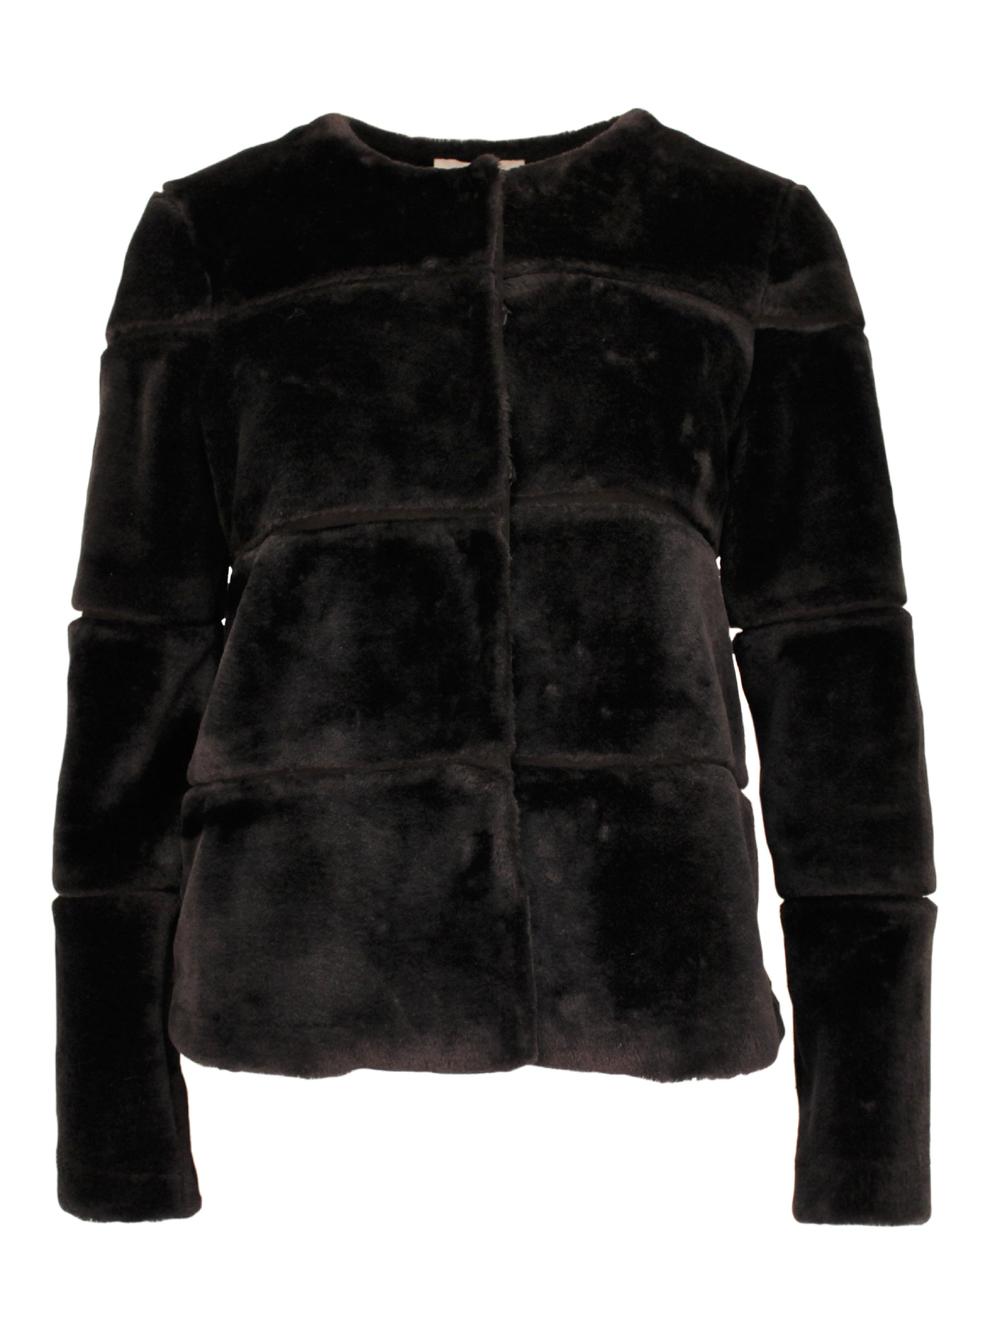 New Kahla Faux Fur jacket Black